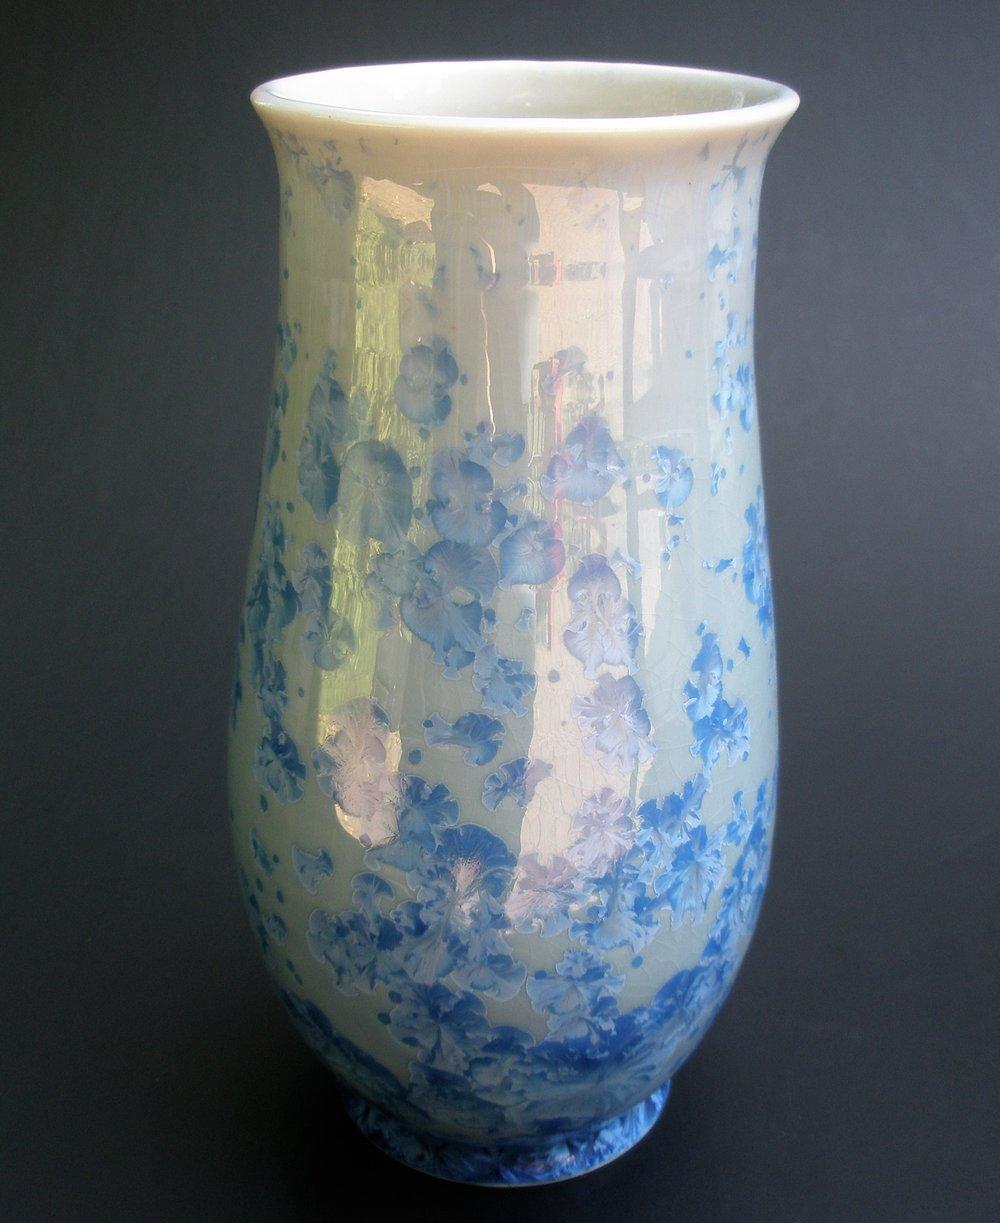 Small Crystalline Glazed Vase